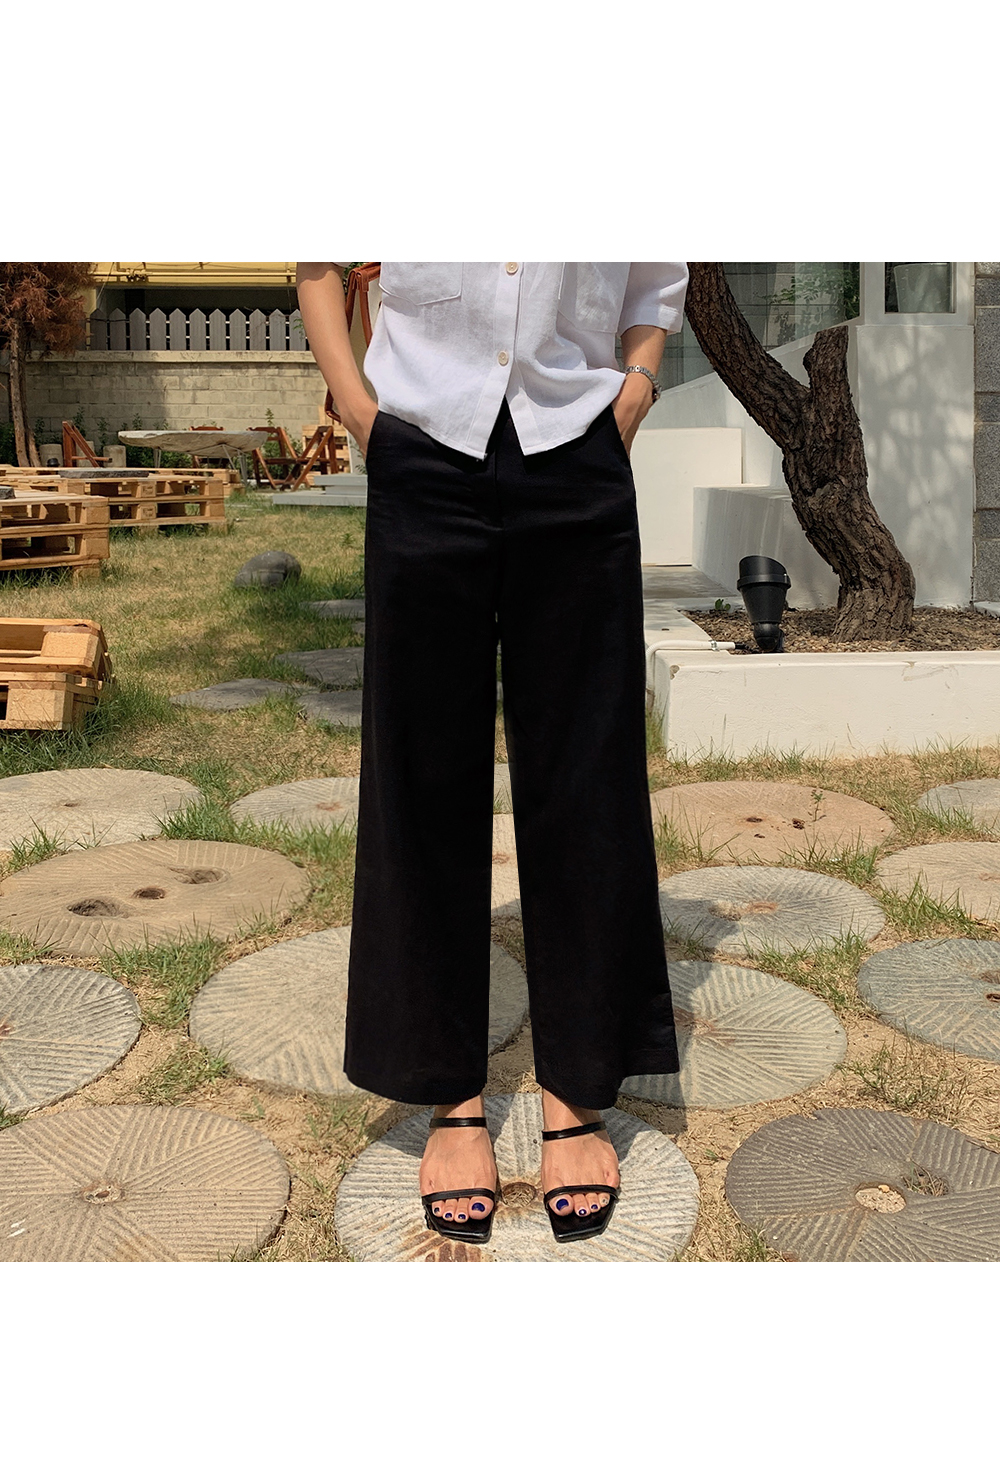 Ankle Straight Linen Pants-holiholic.com